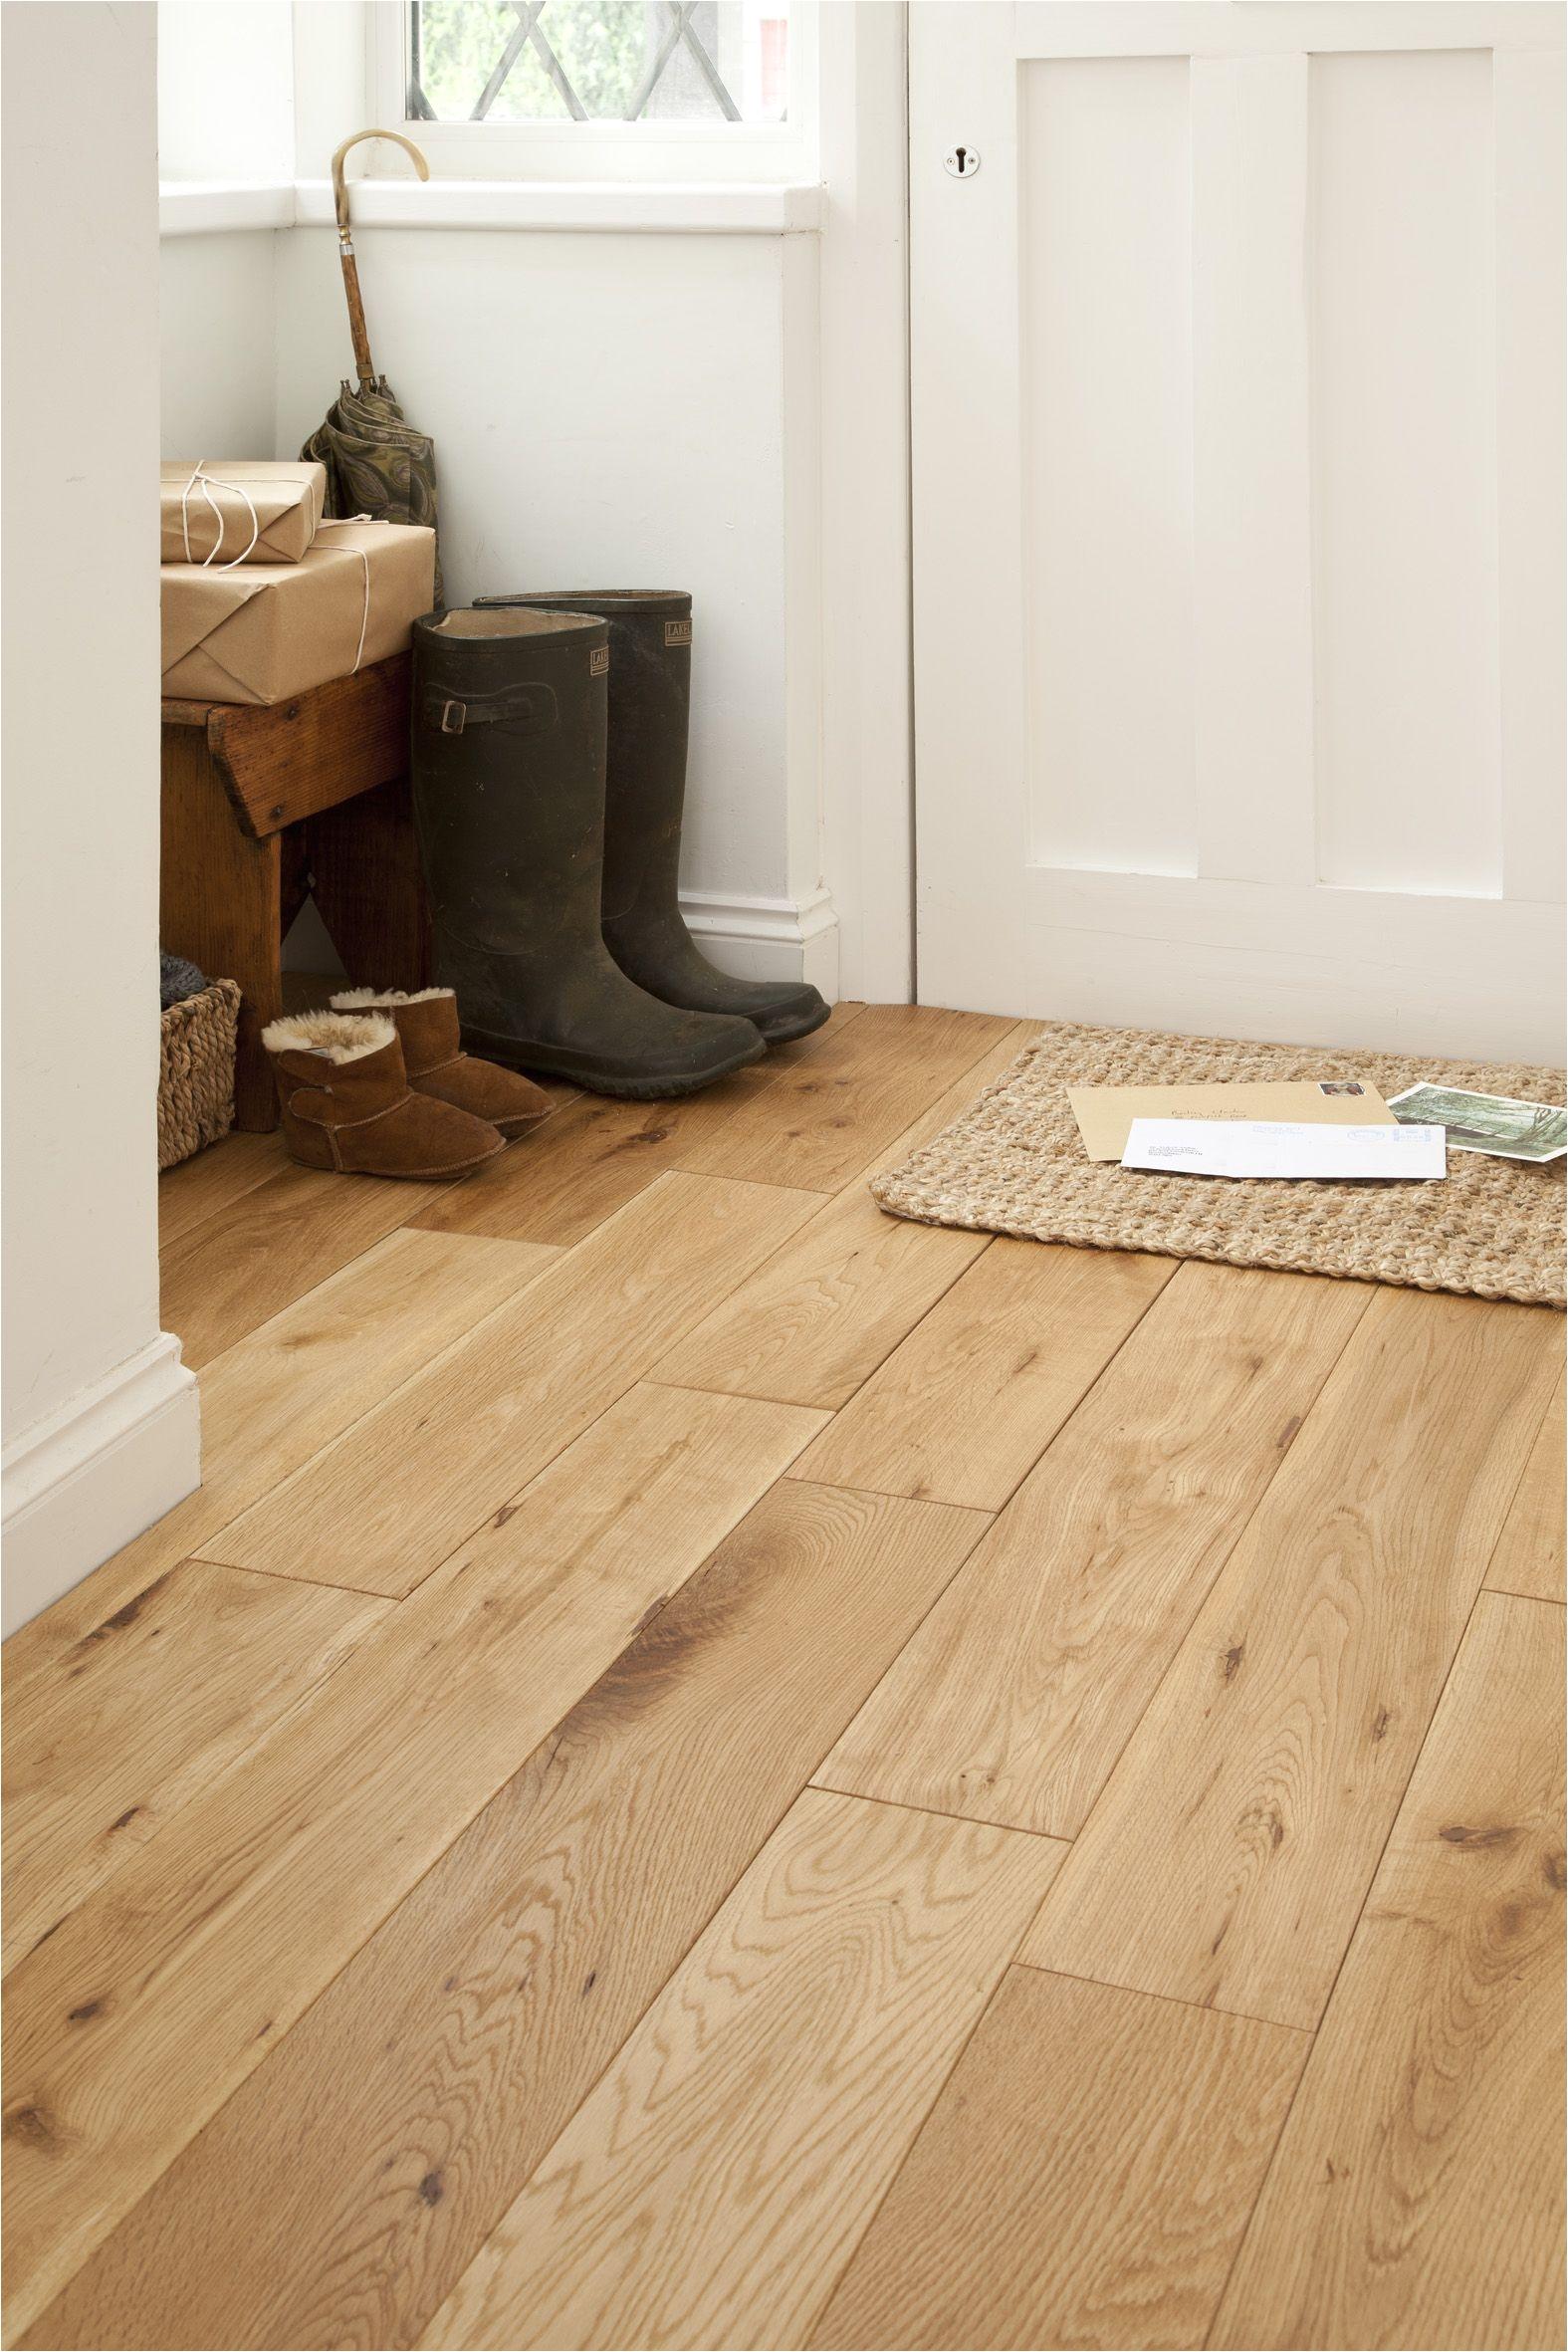 Most Durable Hardwood Floors Beautifully Warm solid Oak Flooring Quite Like This Very Similar